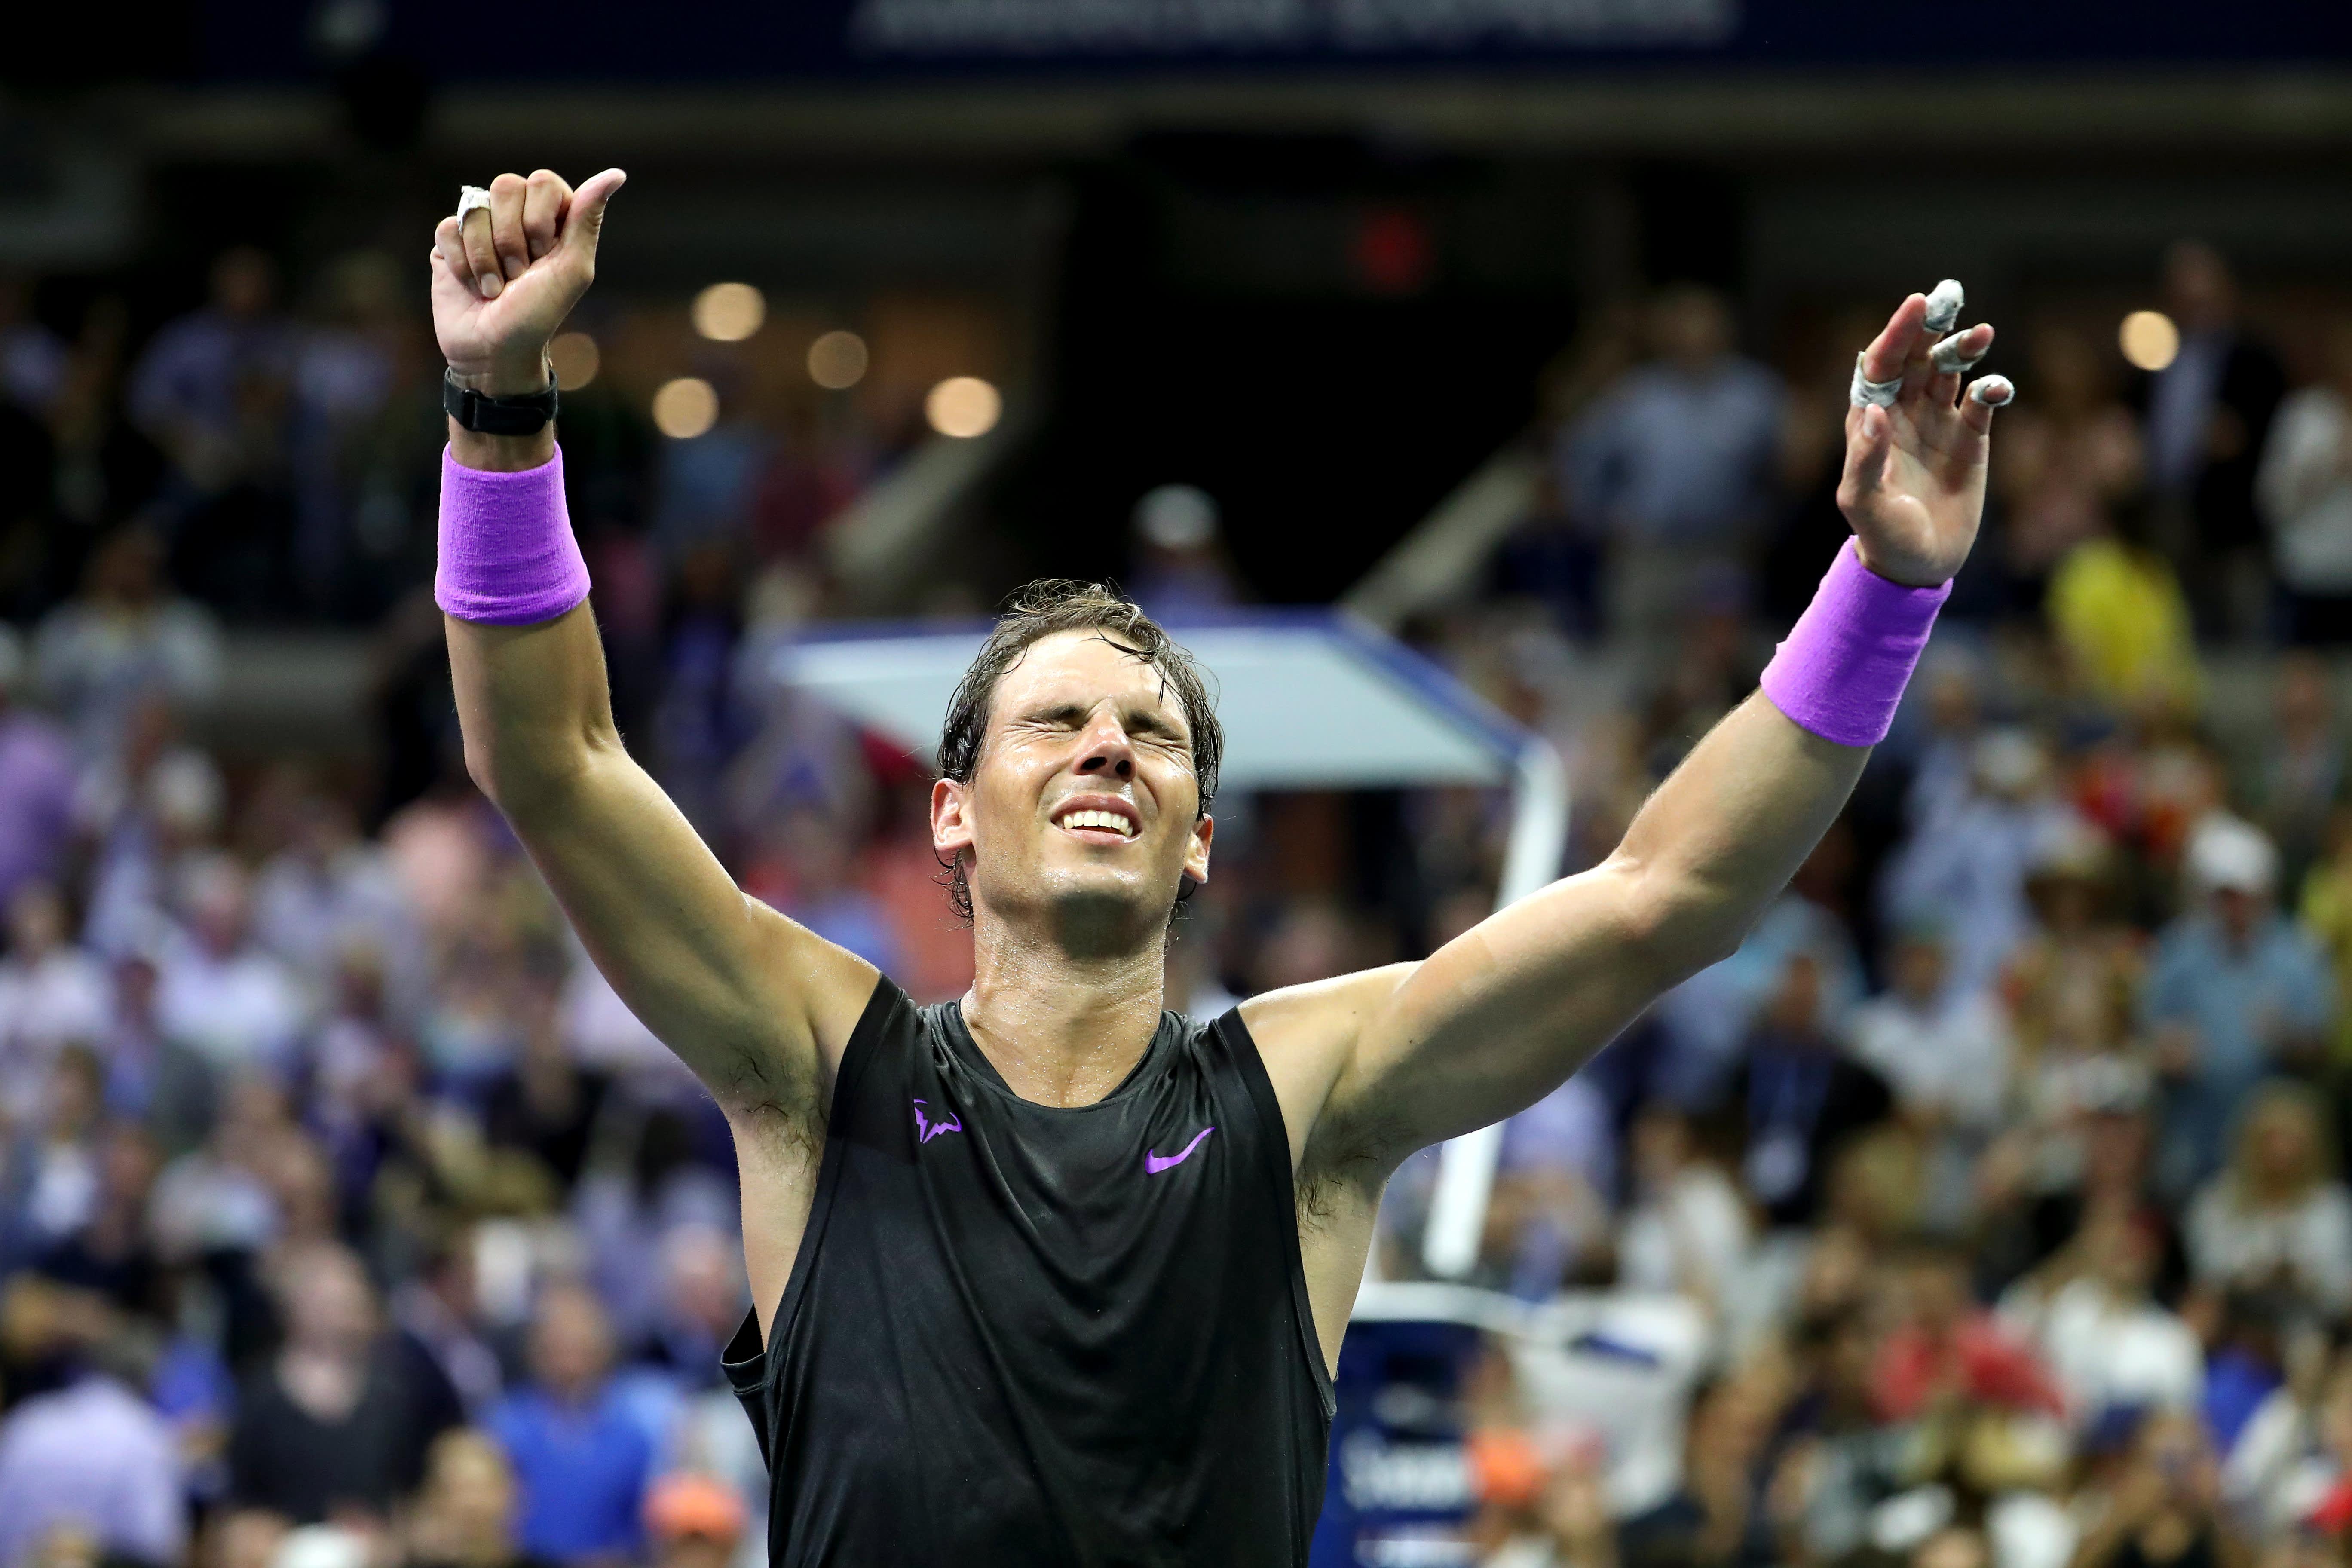 Rafael Nadal beats Daniil Medvedev to win US Open and claim 19th Grand Slam title